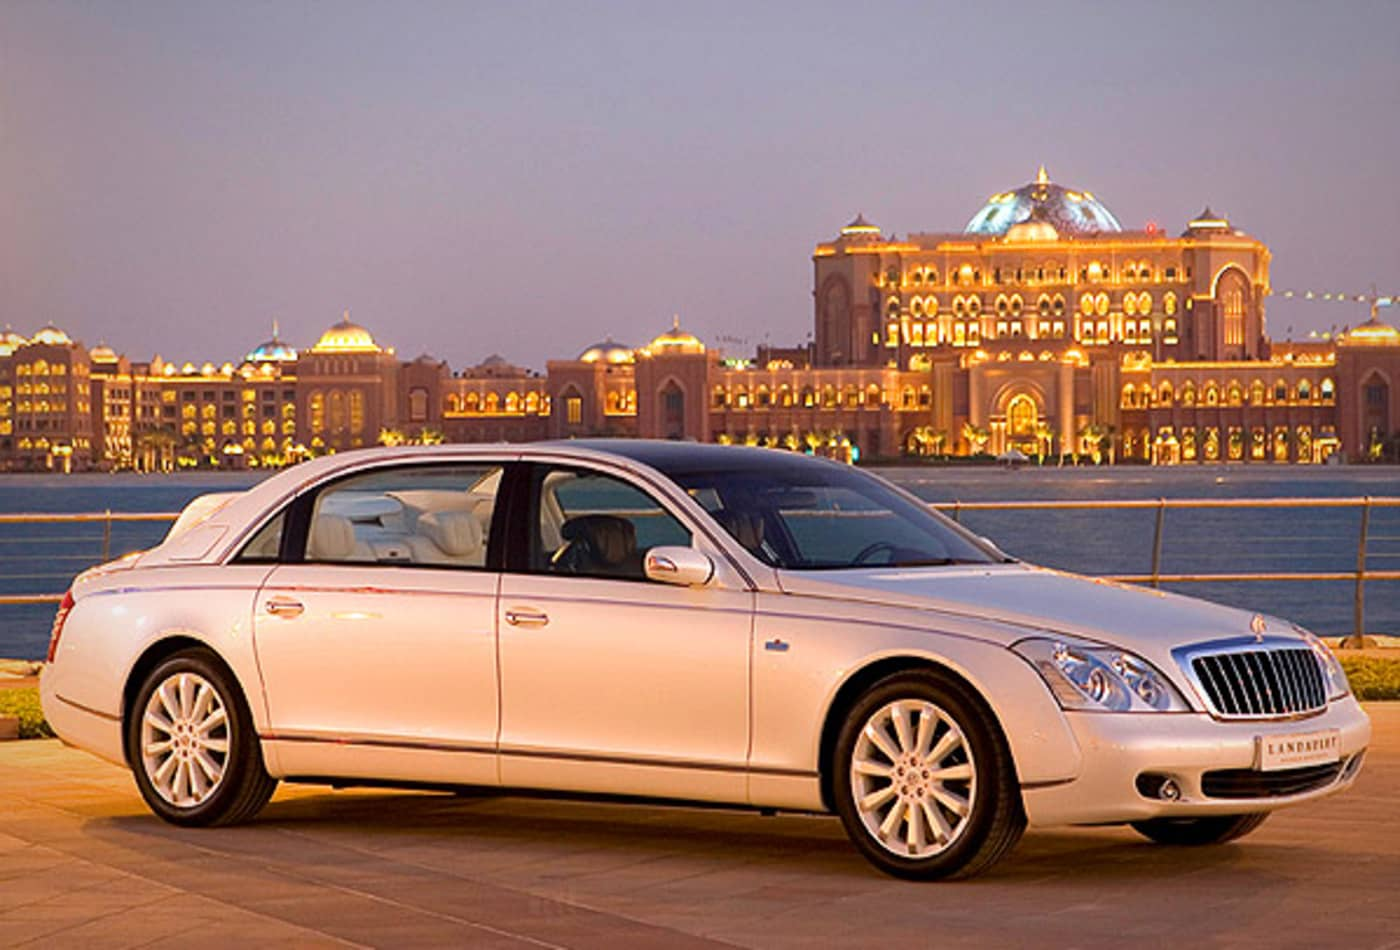 SS_Million_Dollar_Cars_Maybach_Landaulet.jpg